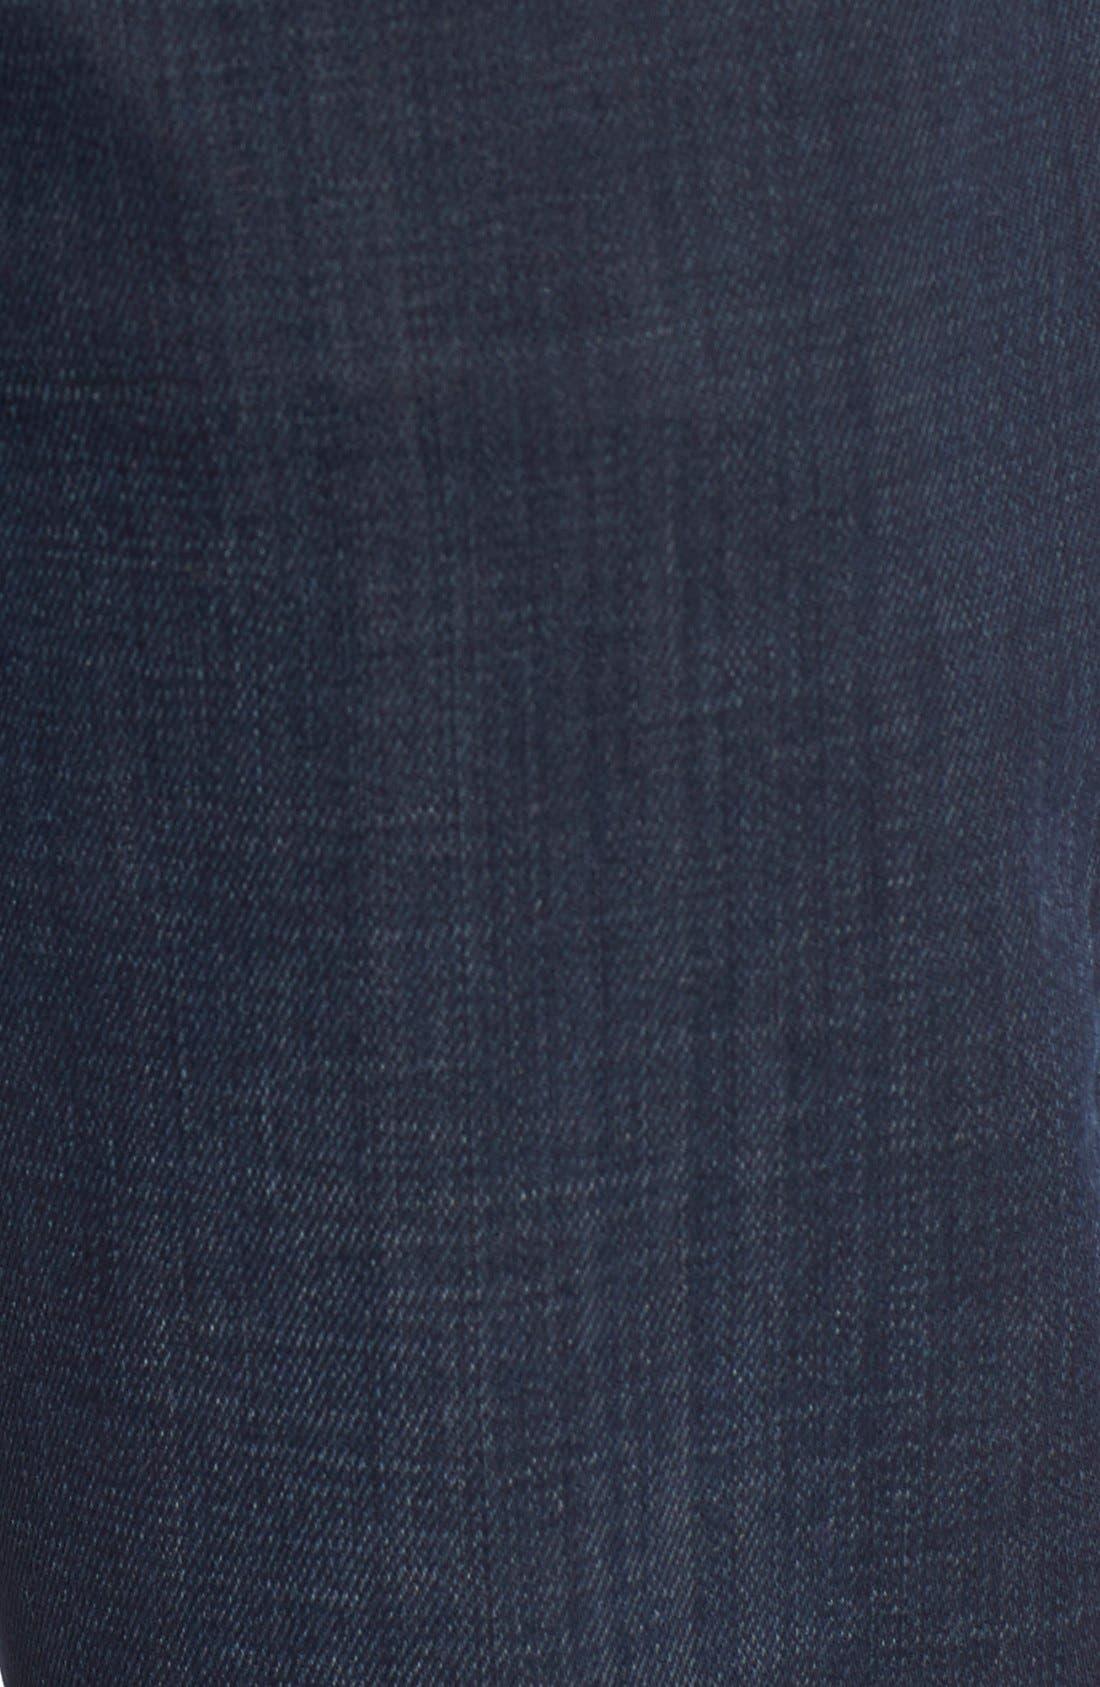 Gage Slim Straight Leg Jeans,                             Alternate thumbnail 5, color,                             Duvall